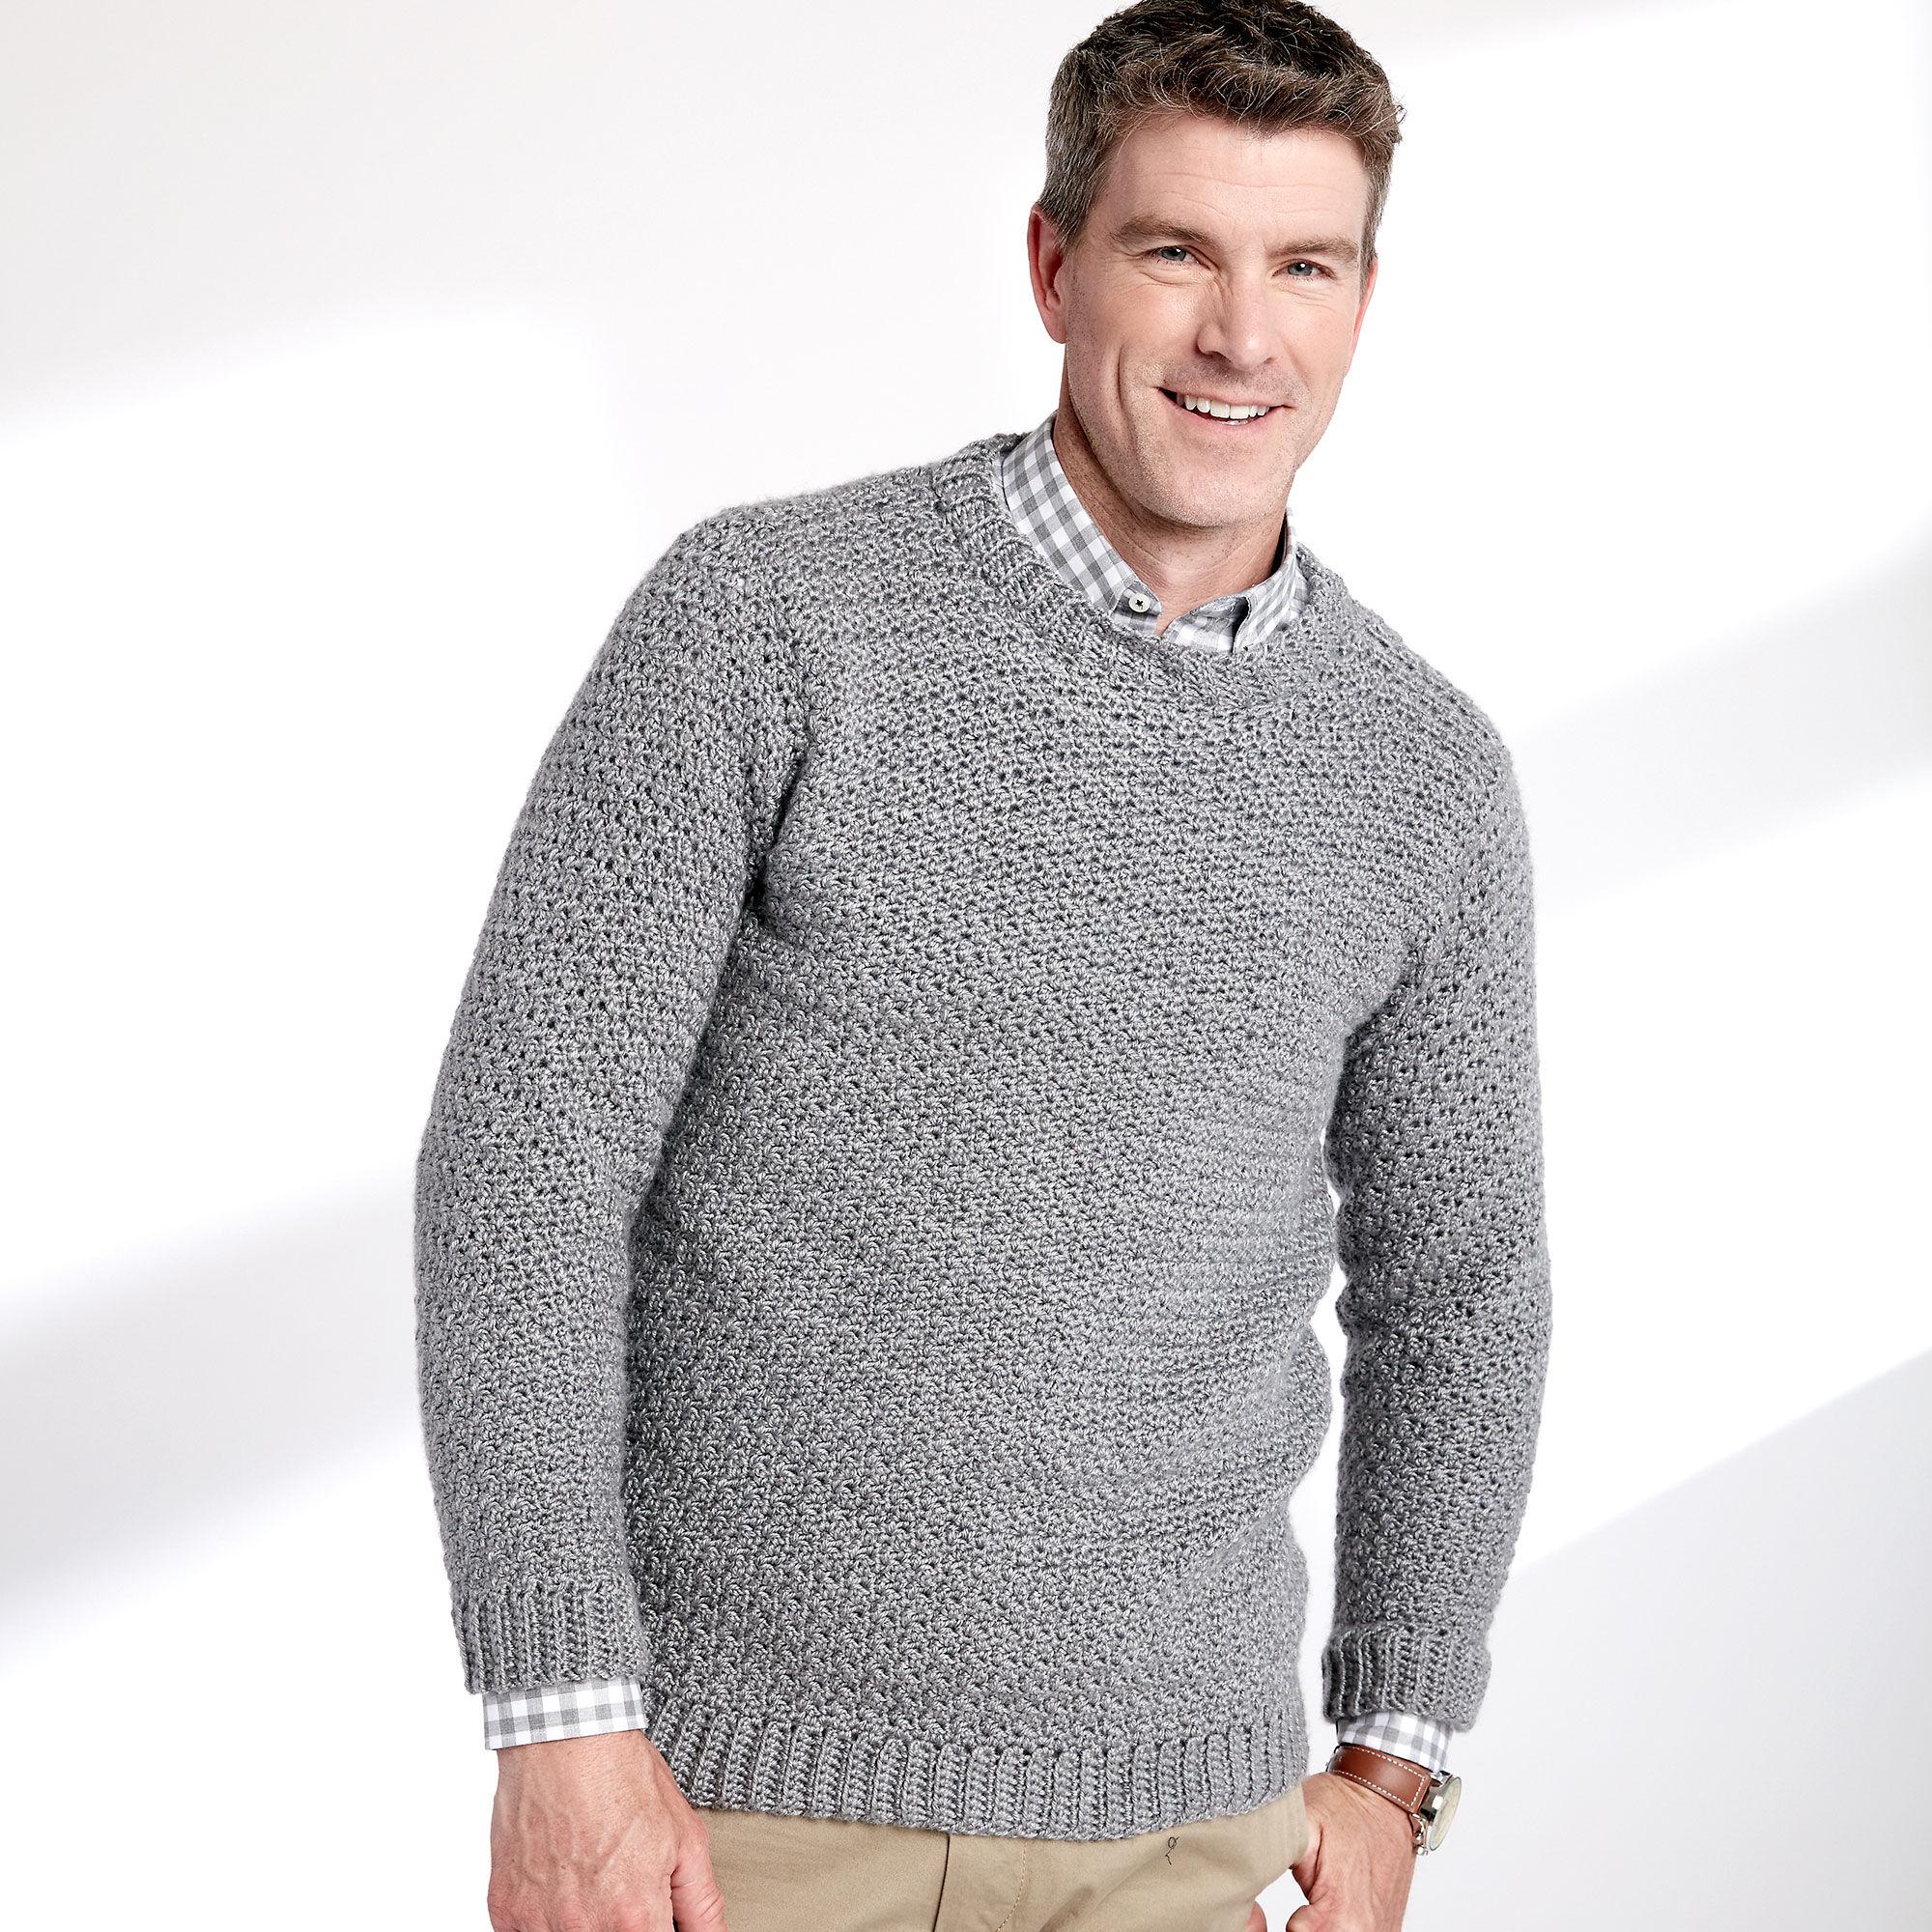 Caron Adult Crochet Crew Neck Pullover, XS/S | Yarnspirations